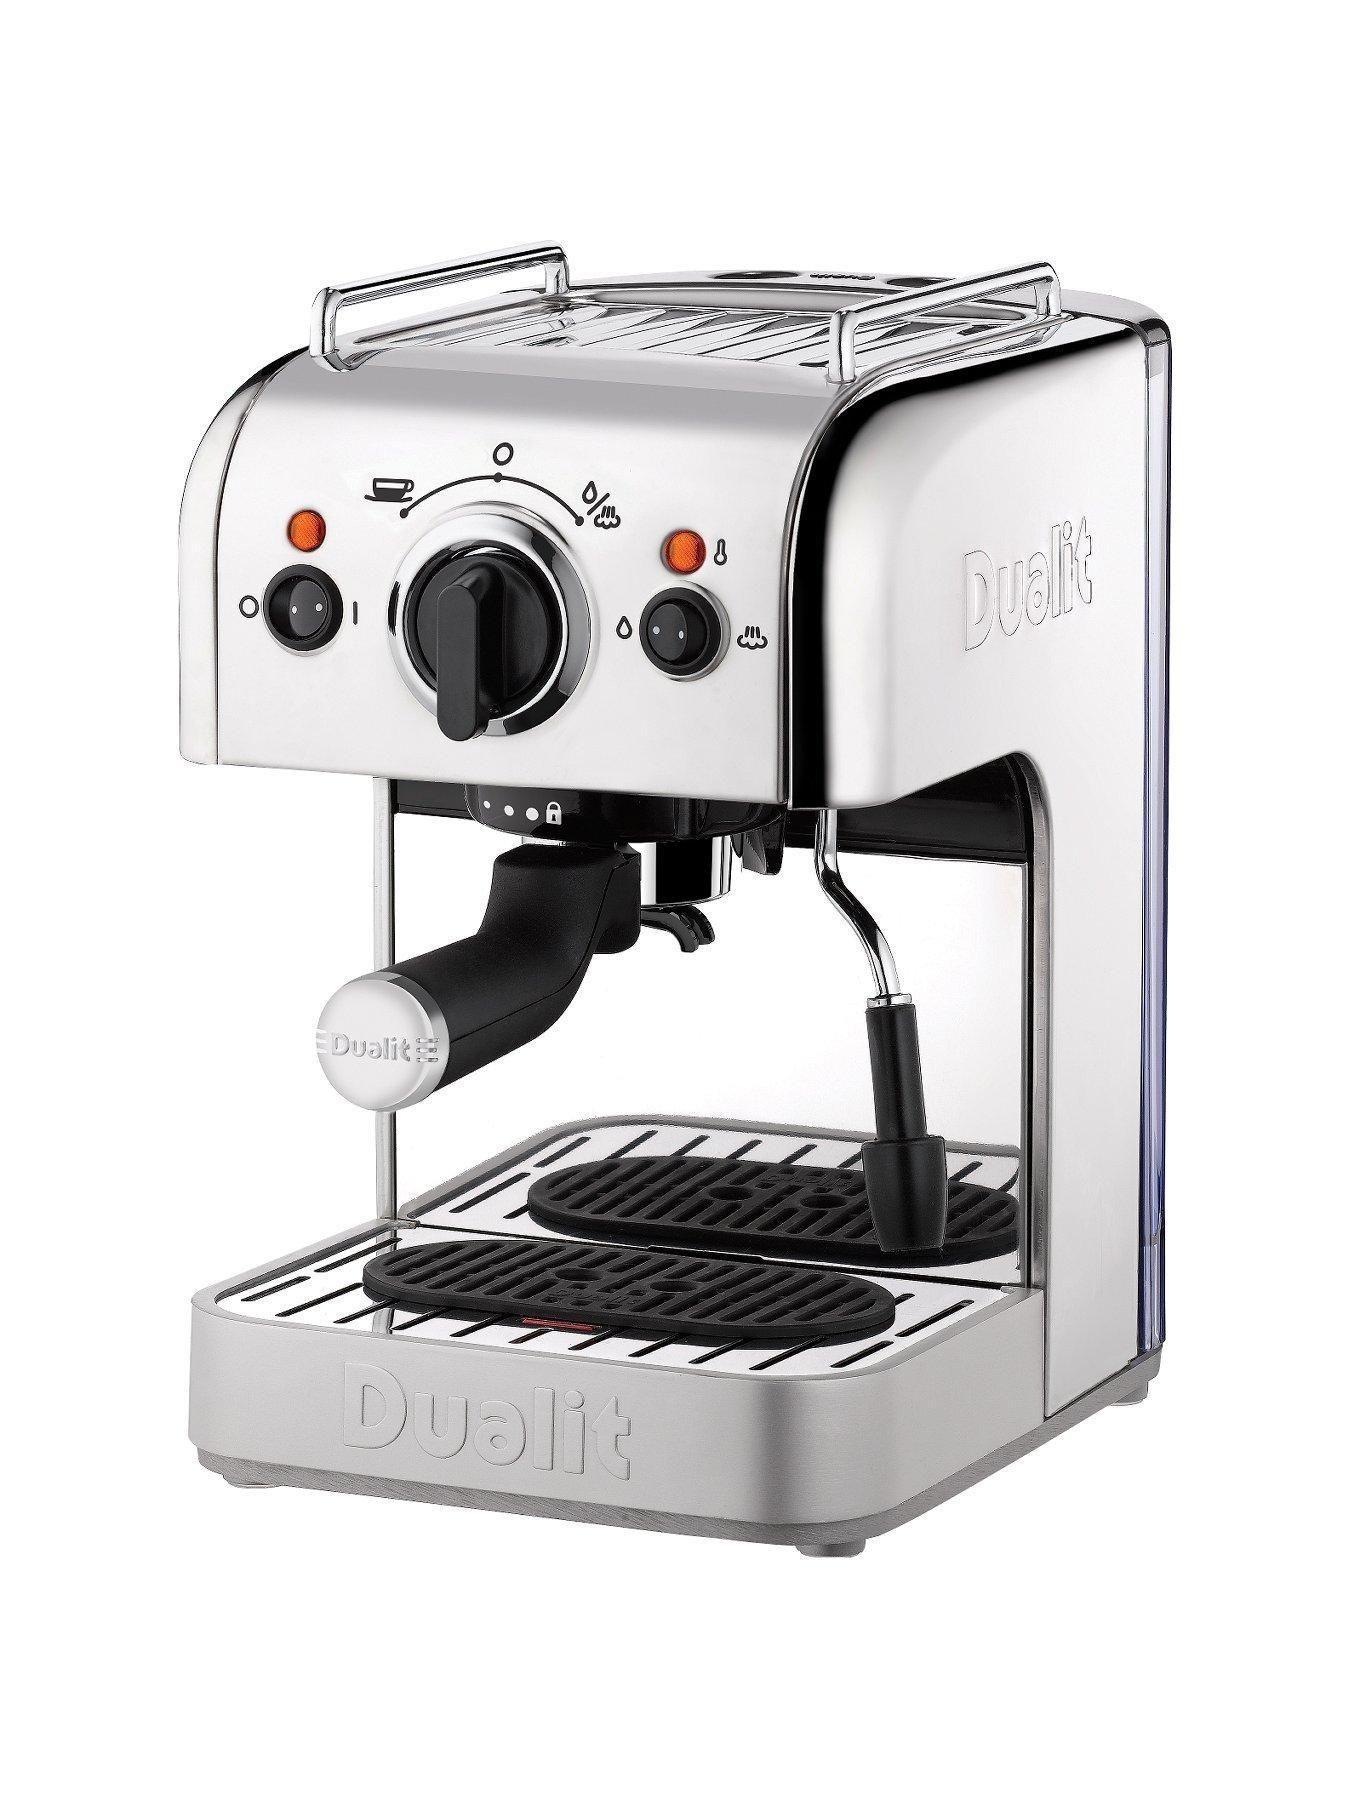 84440 3in1 Coffee Machine Dualit, Espresso coffee